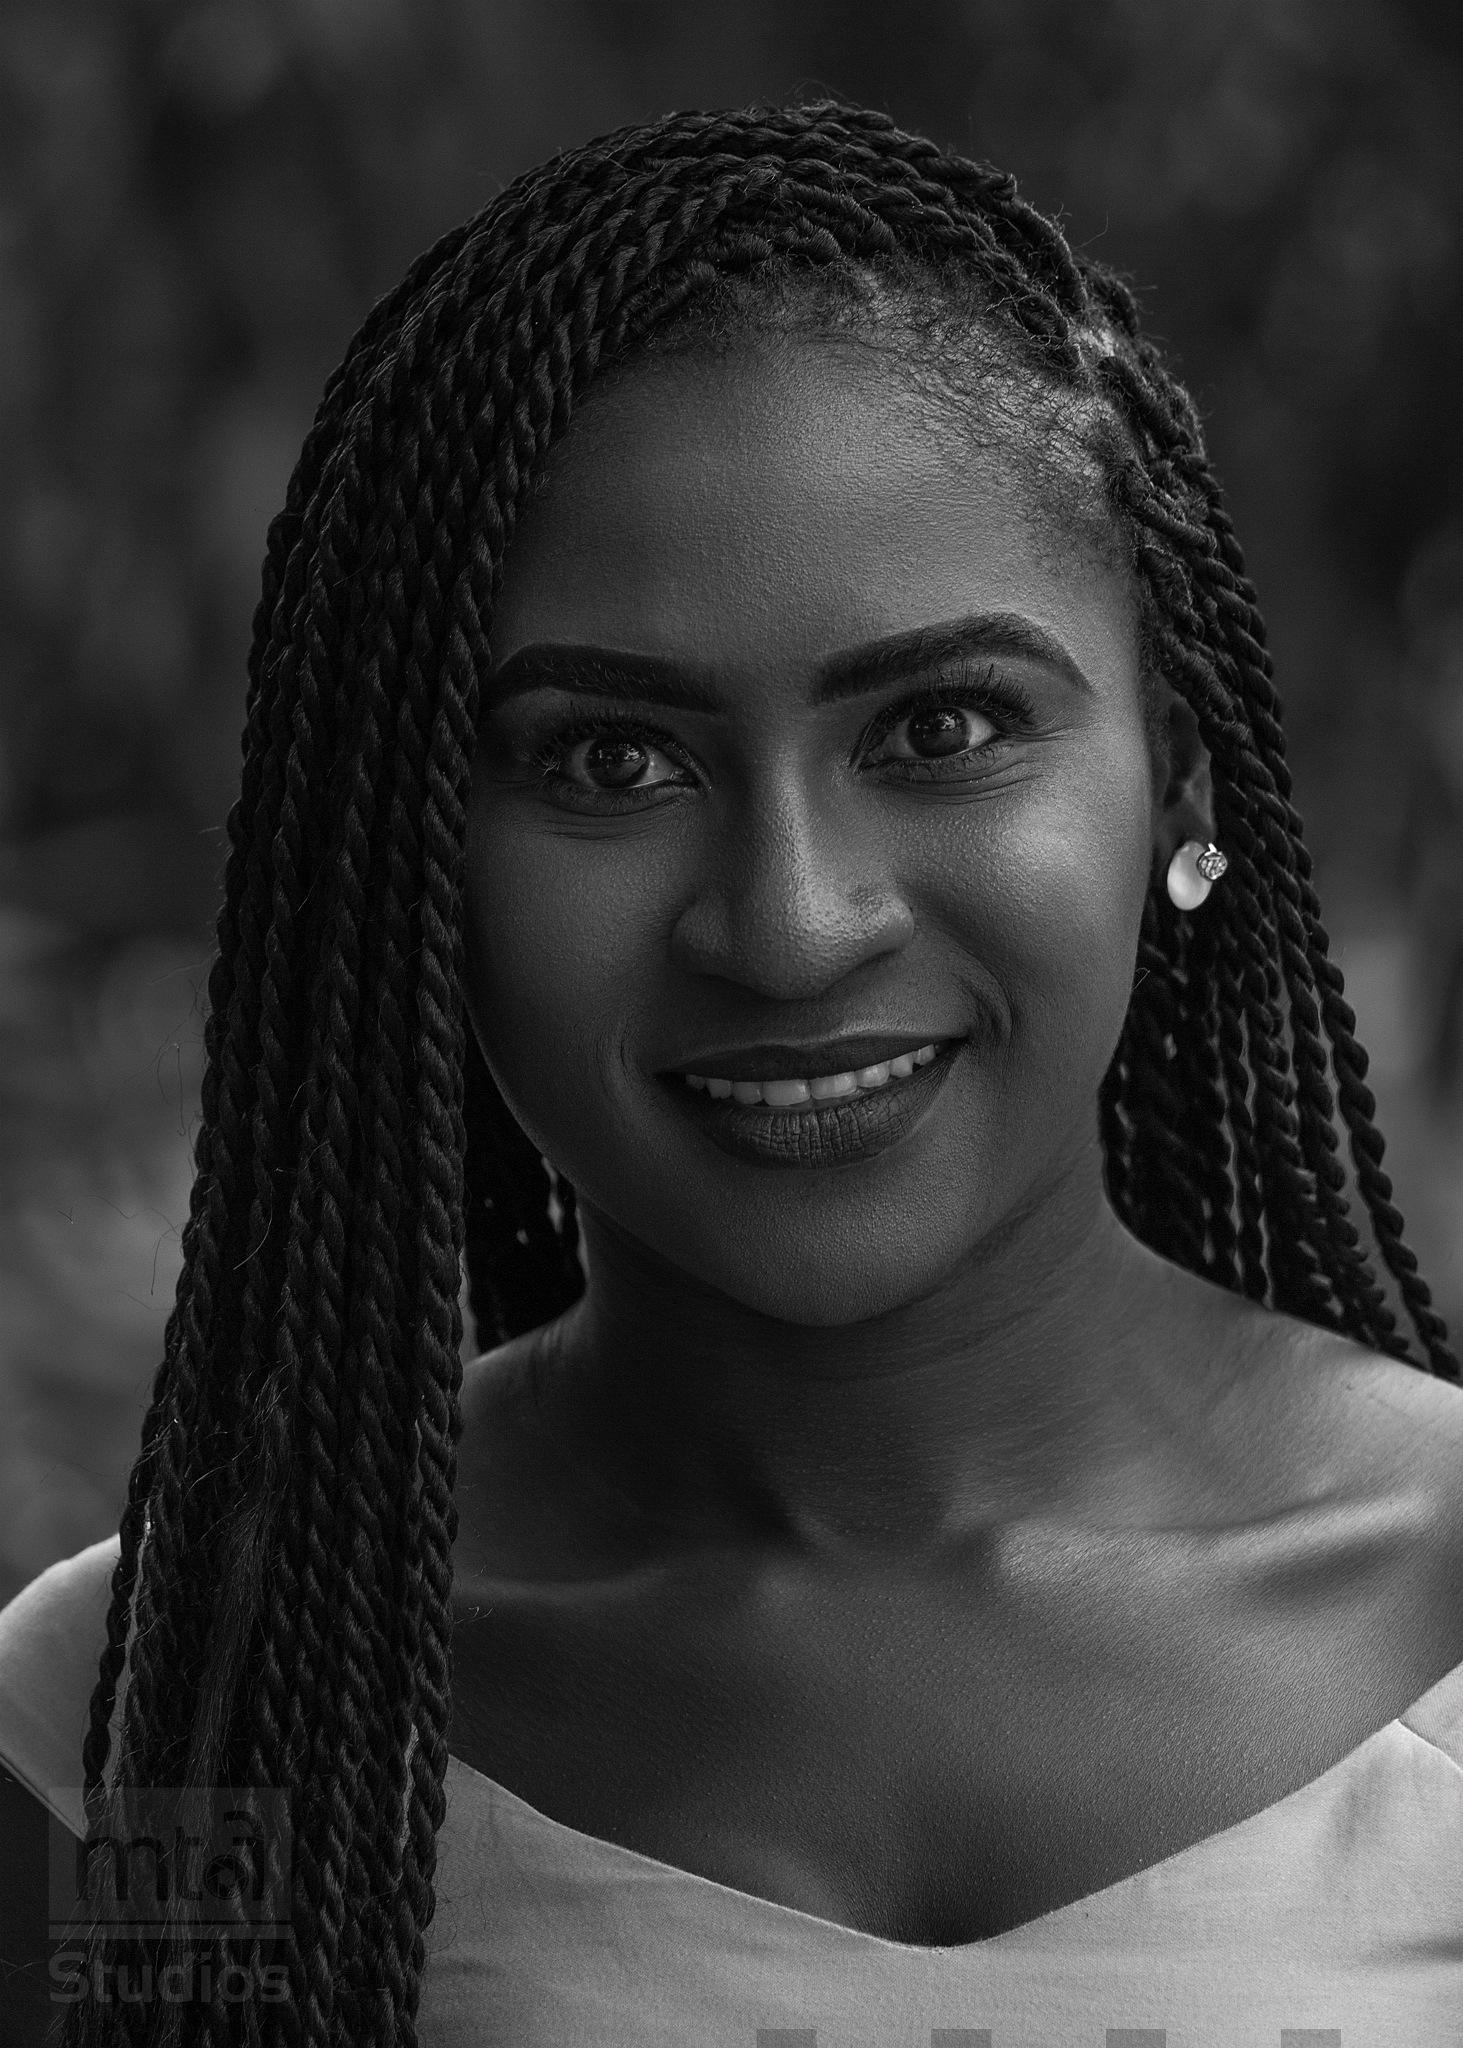 Abbie by mawulitofah